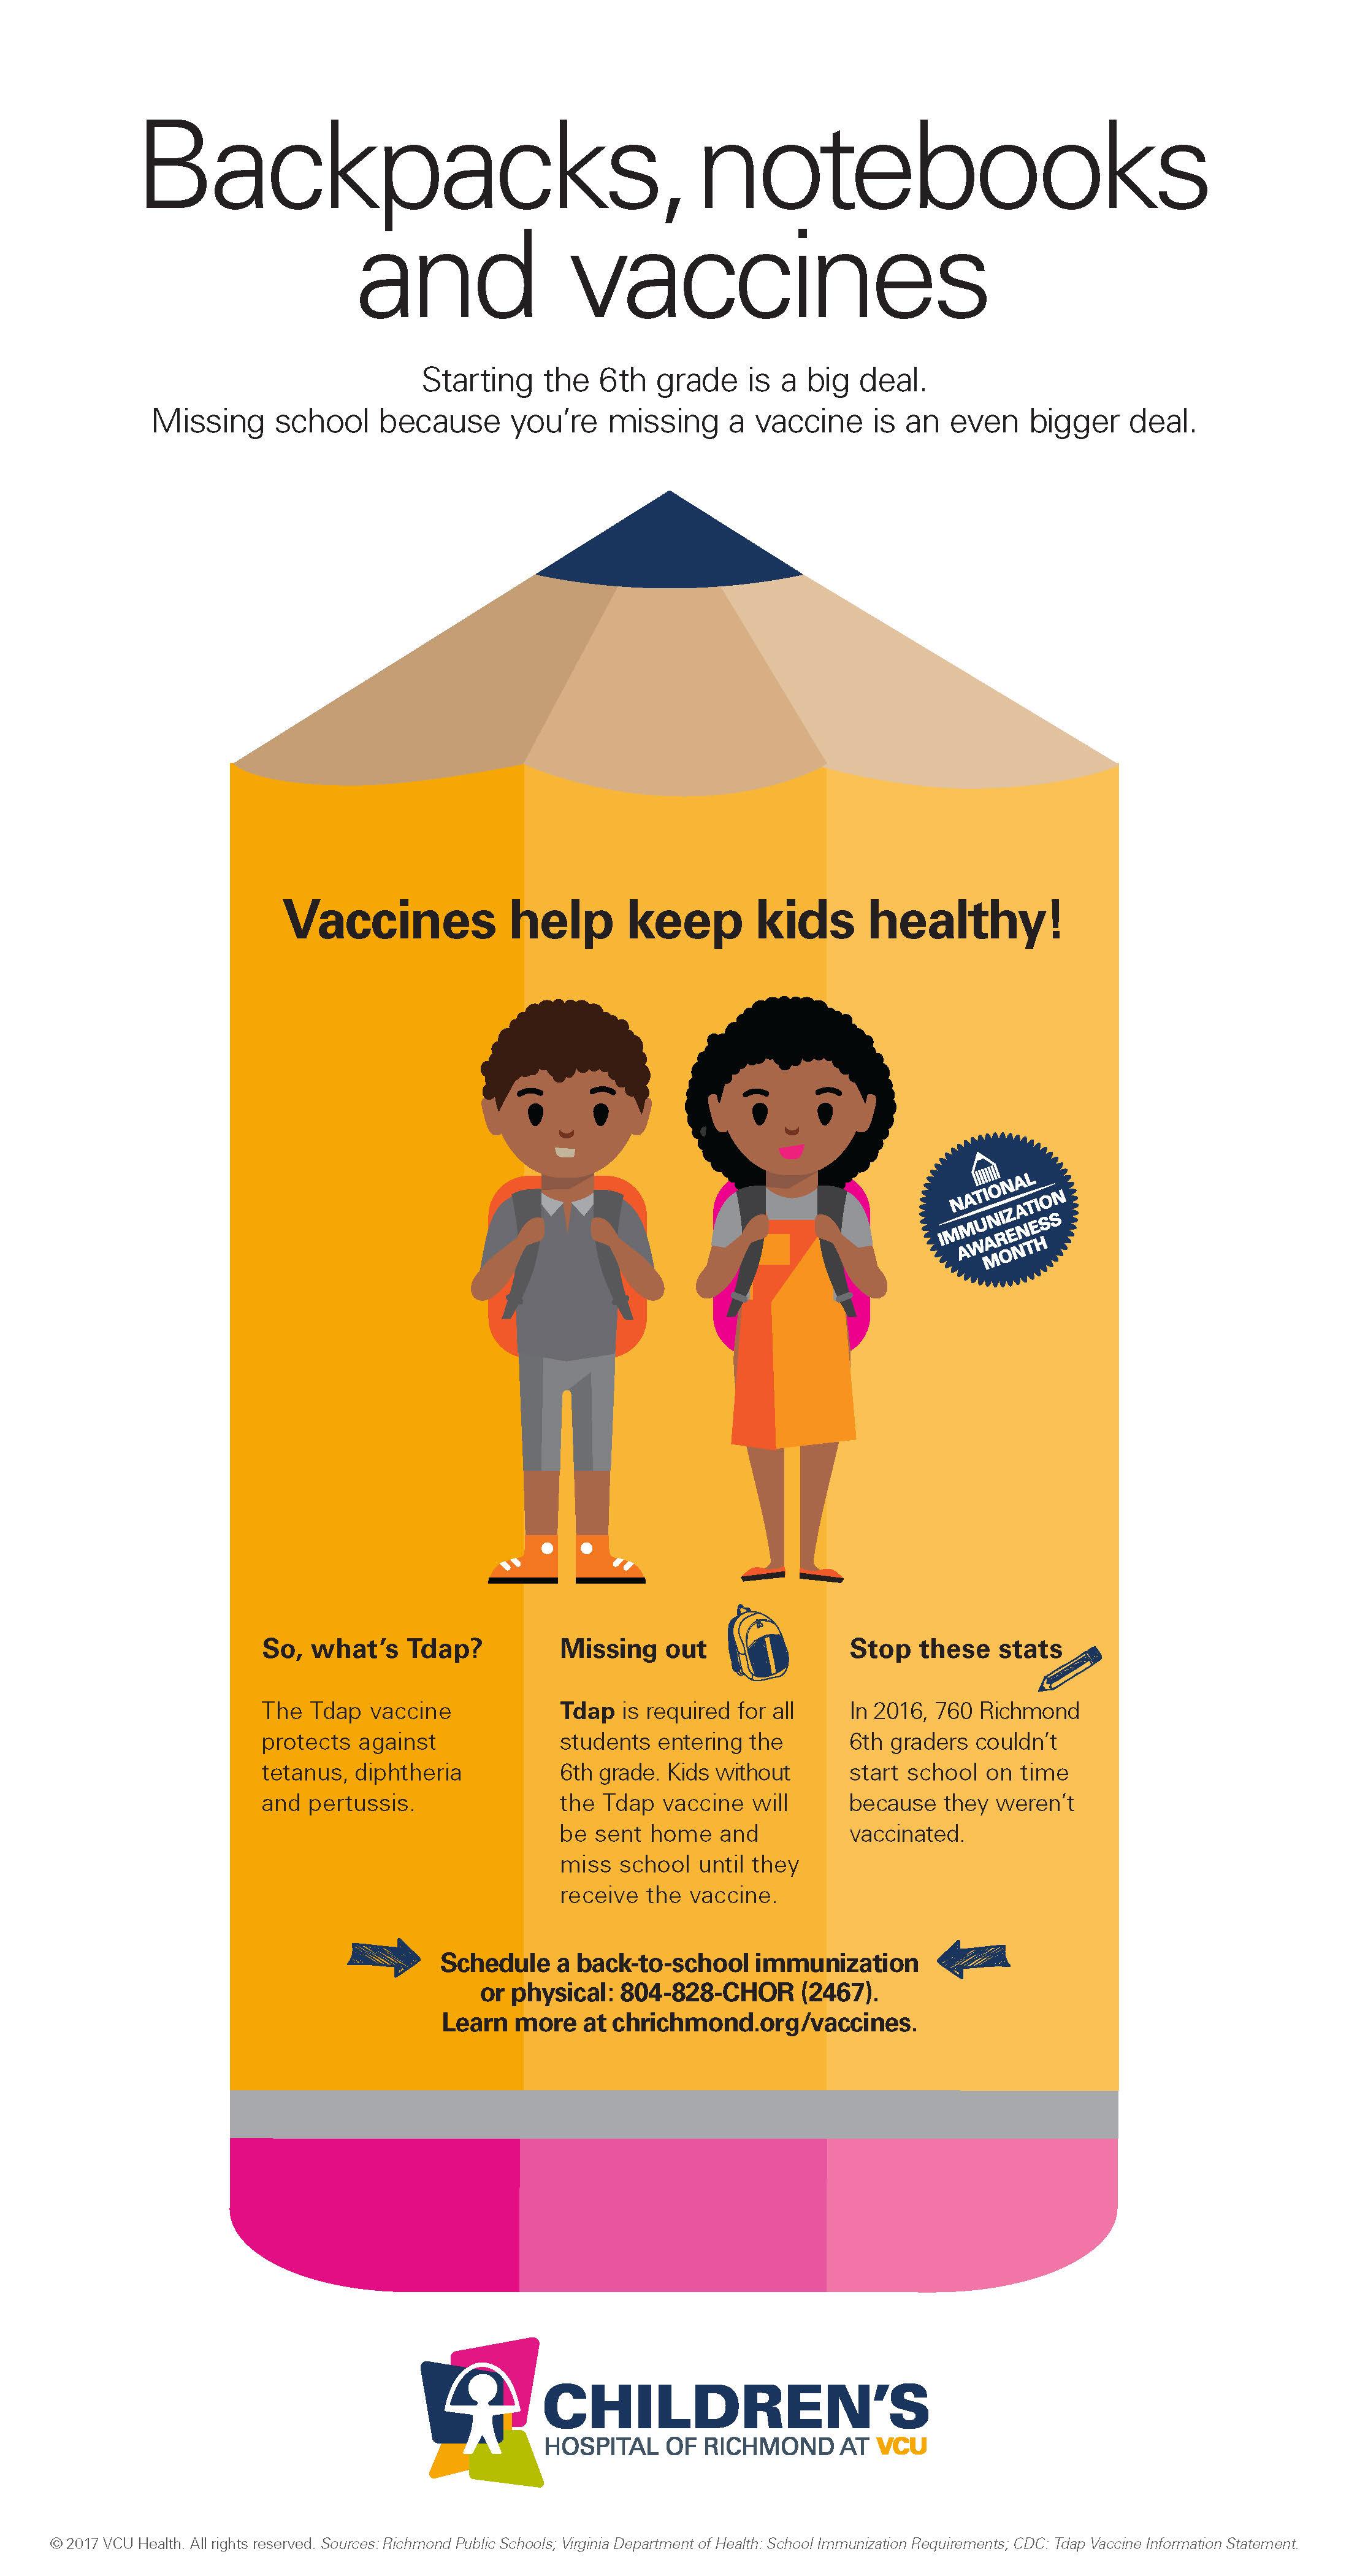 2017 7 August Free Press Immunizations.jpg